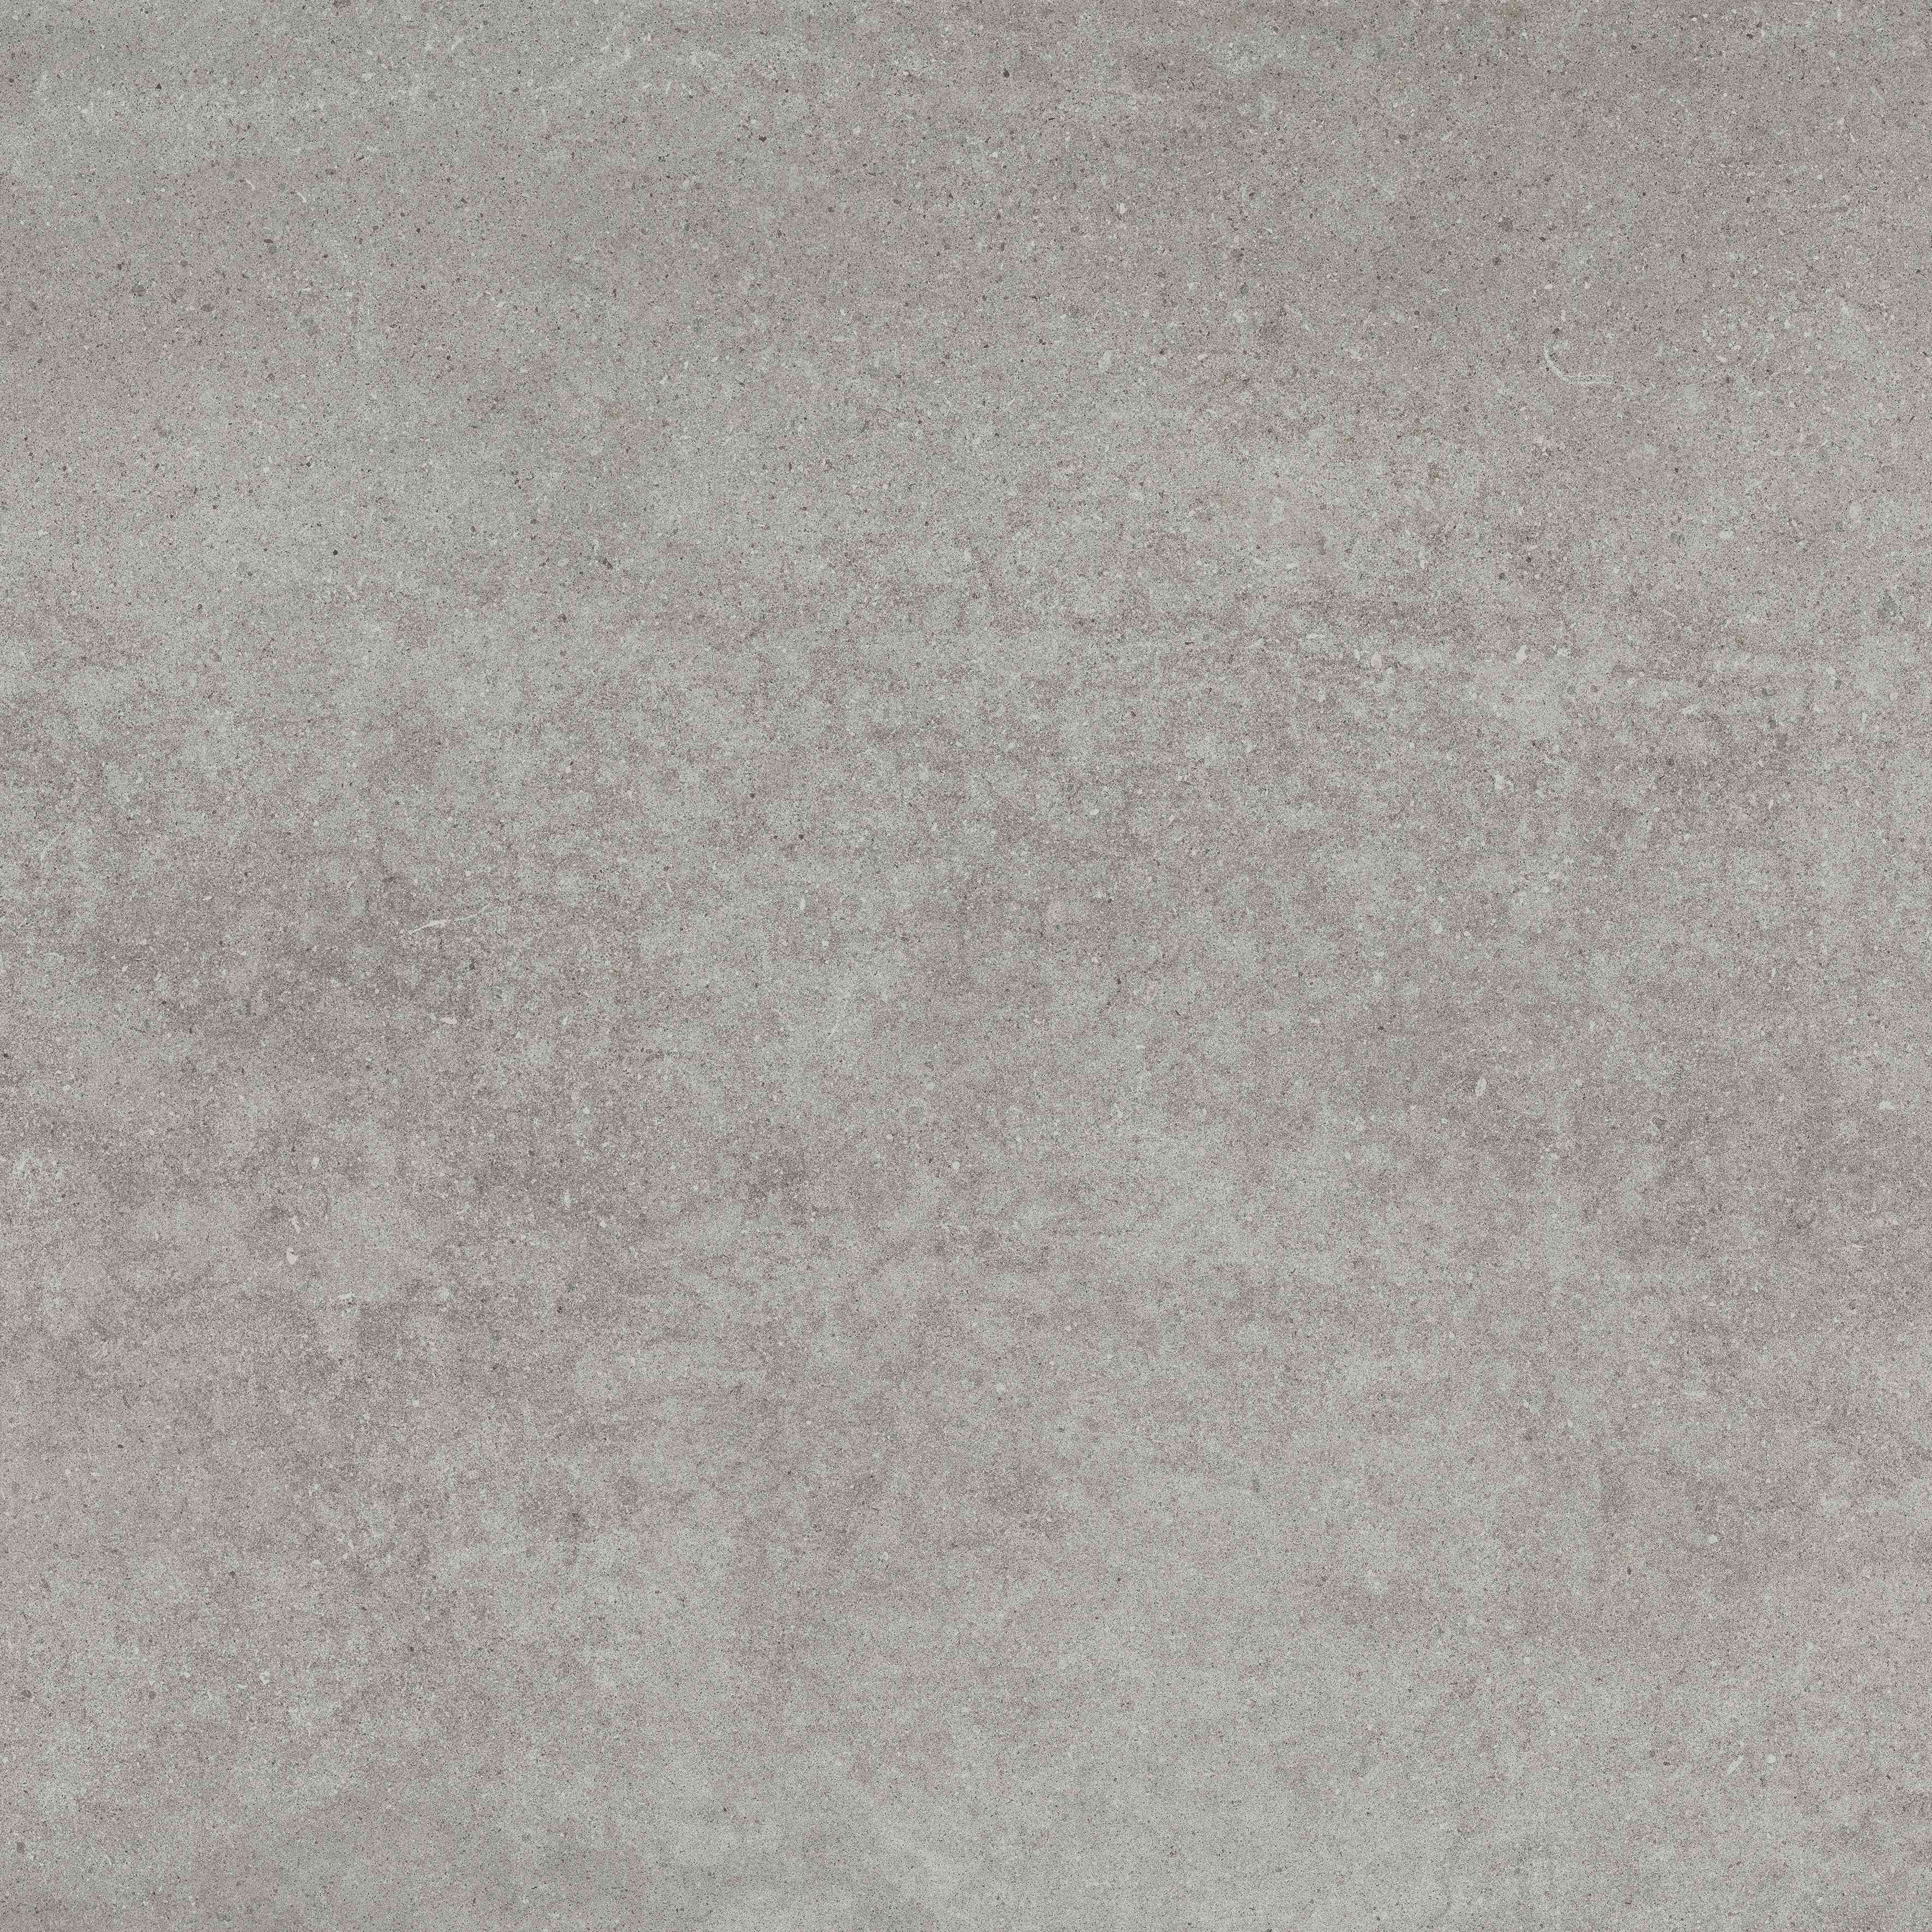 Плитка GRIGIO (ZRXRM8R) изображение 10